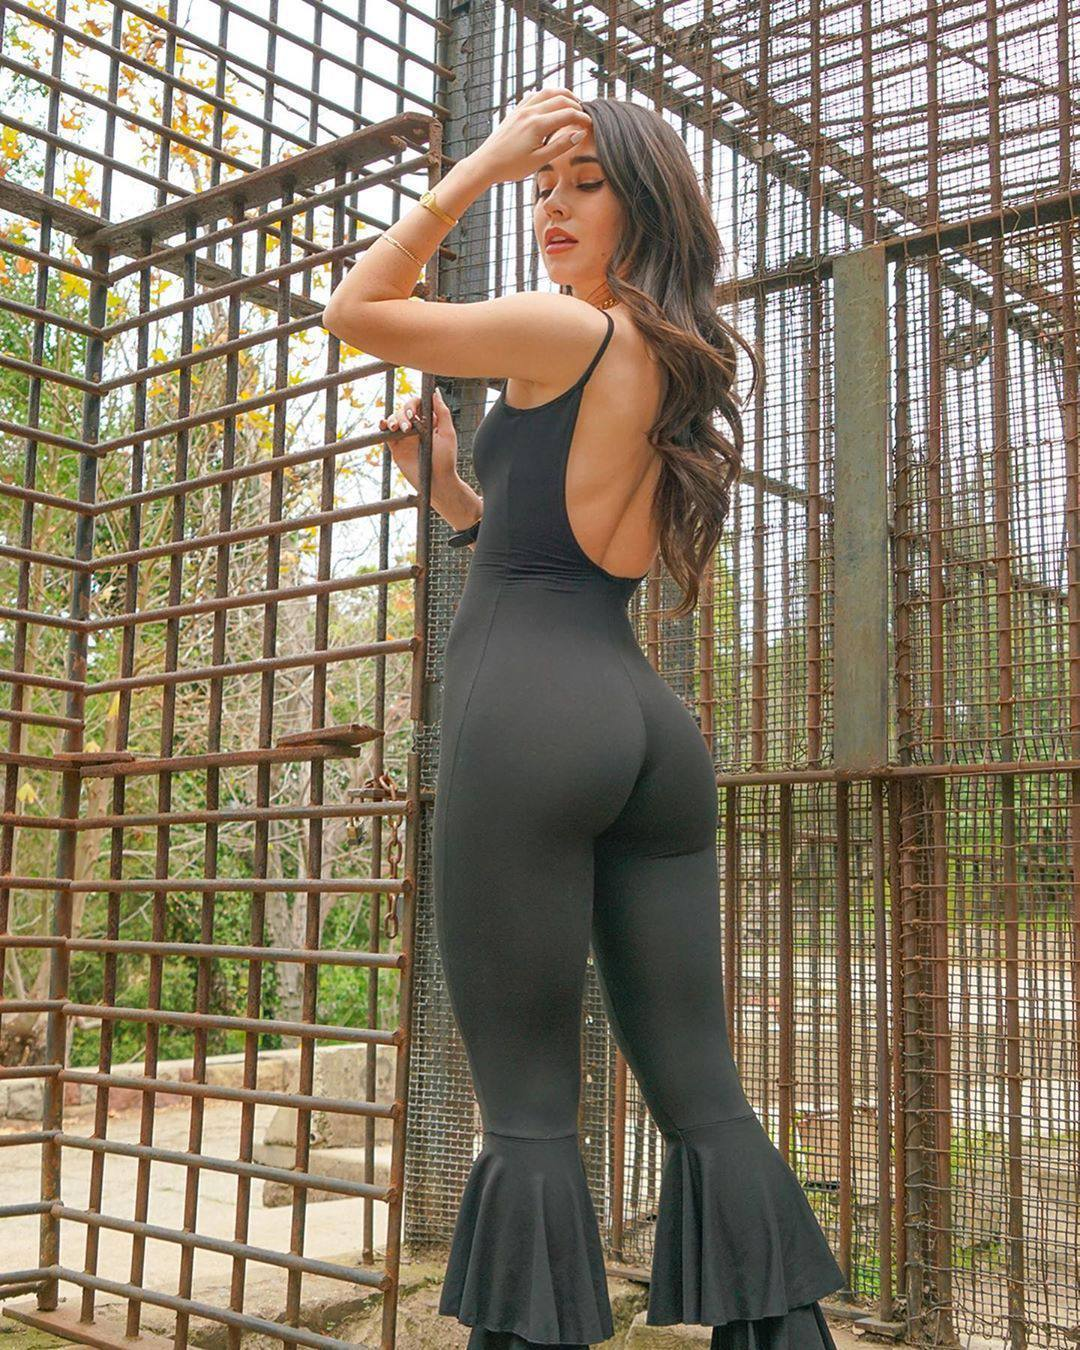 Audrey Bradford Hot Ass In Tight Bodysuit